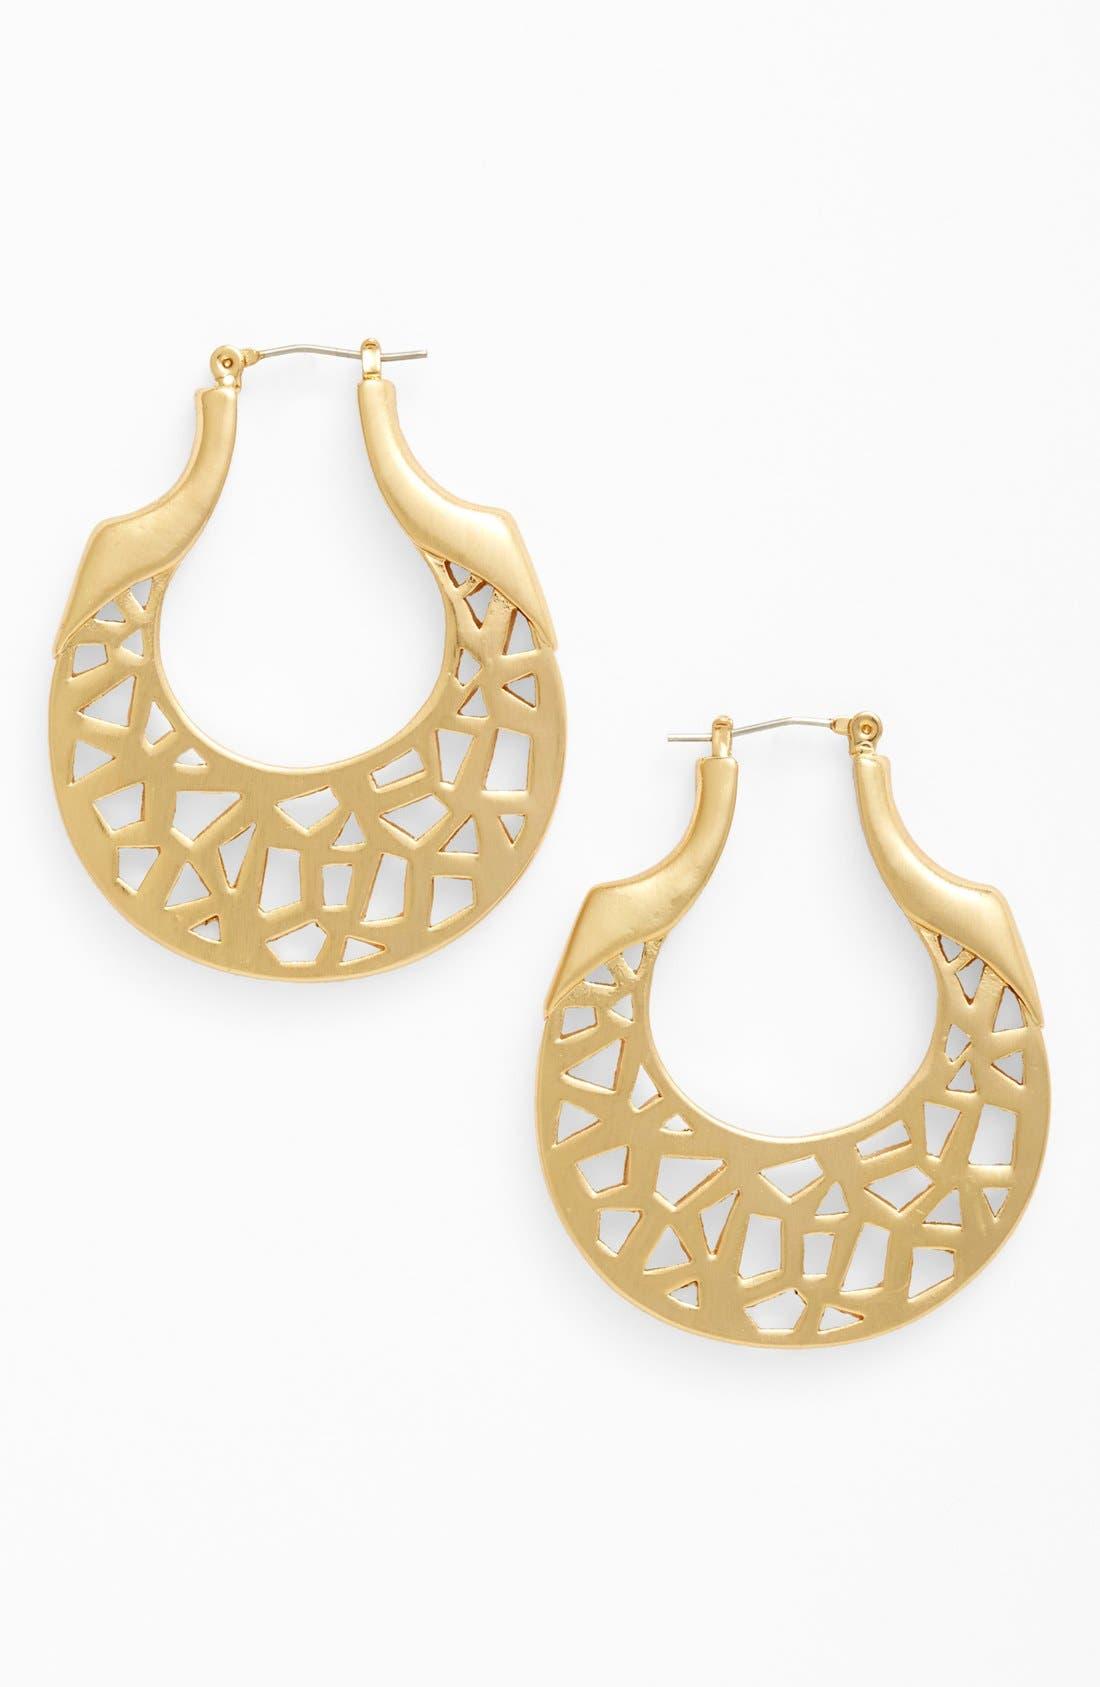 Alternate Image 1 Selected - Vince Camuto 'Mosaic Cut Out' Hoop Earrings